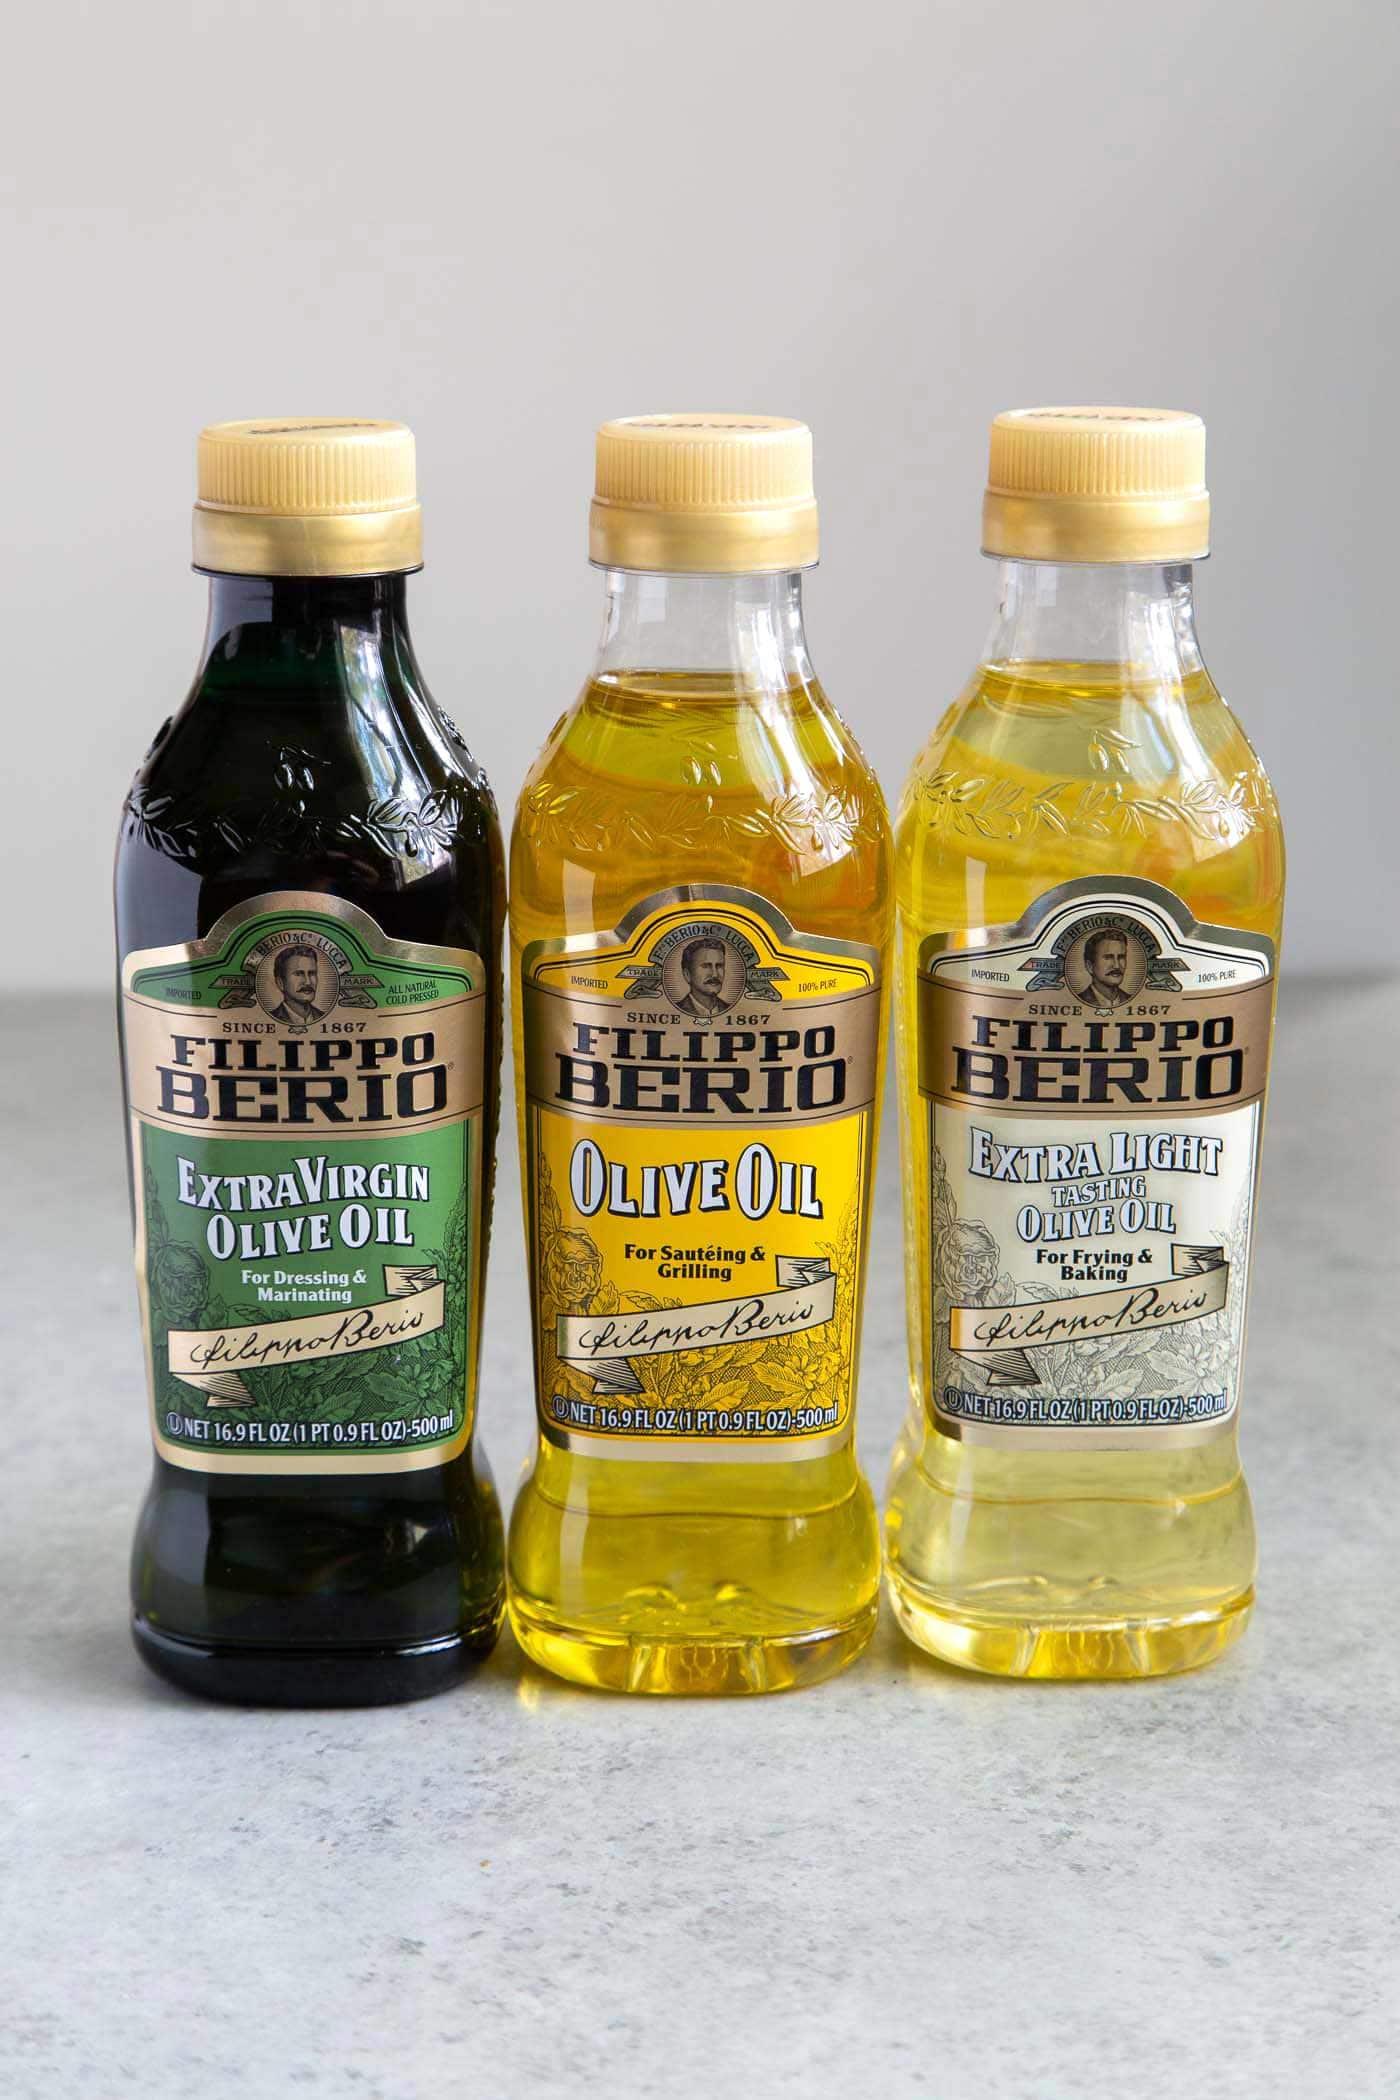 Filippo Berio Olive Oils